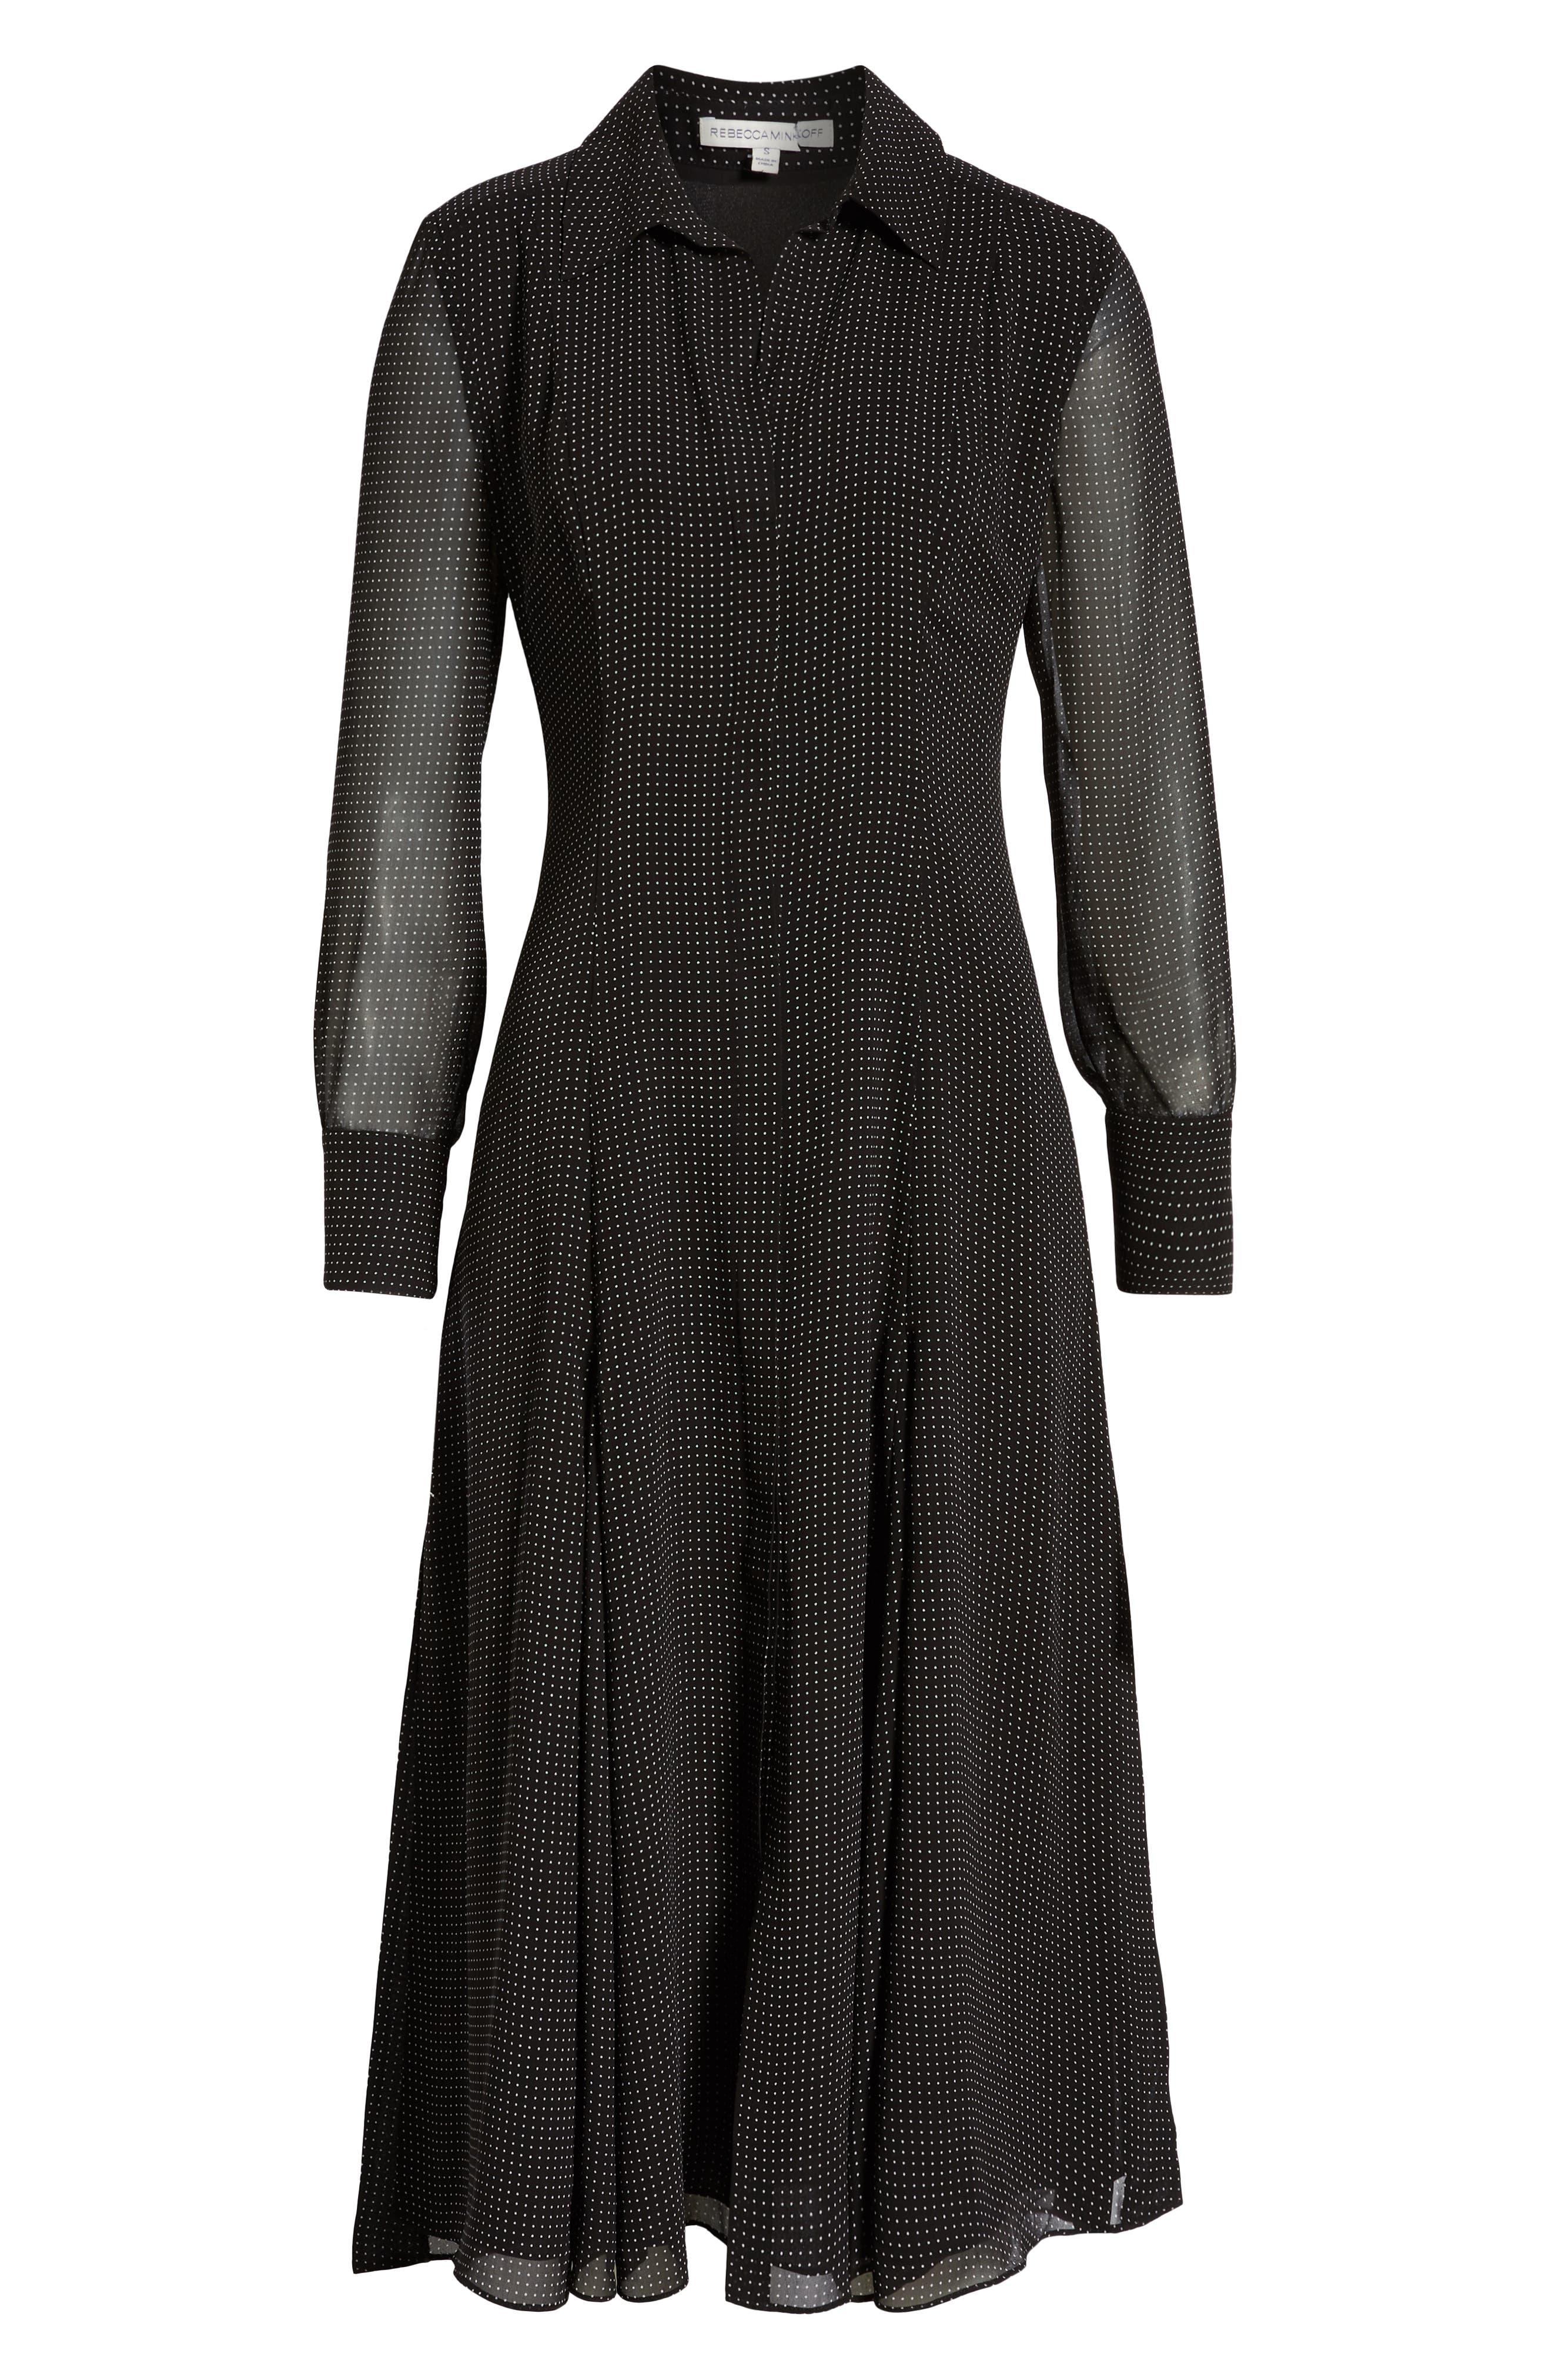 REBECCA MINKOFF,                             Kimberly Dot Sheer Sleeve Dress,                             Alternate thumbnail 7, color,                             BLACK/ WHITE